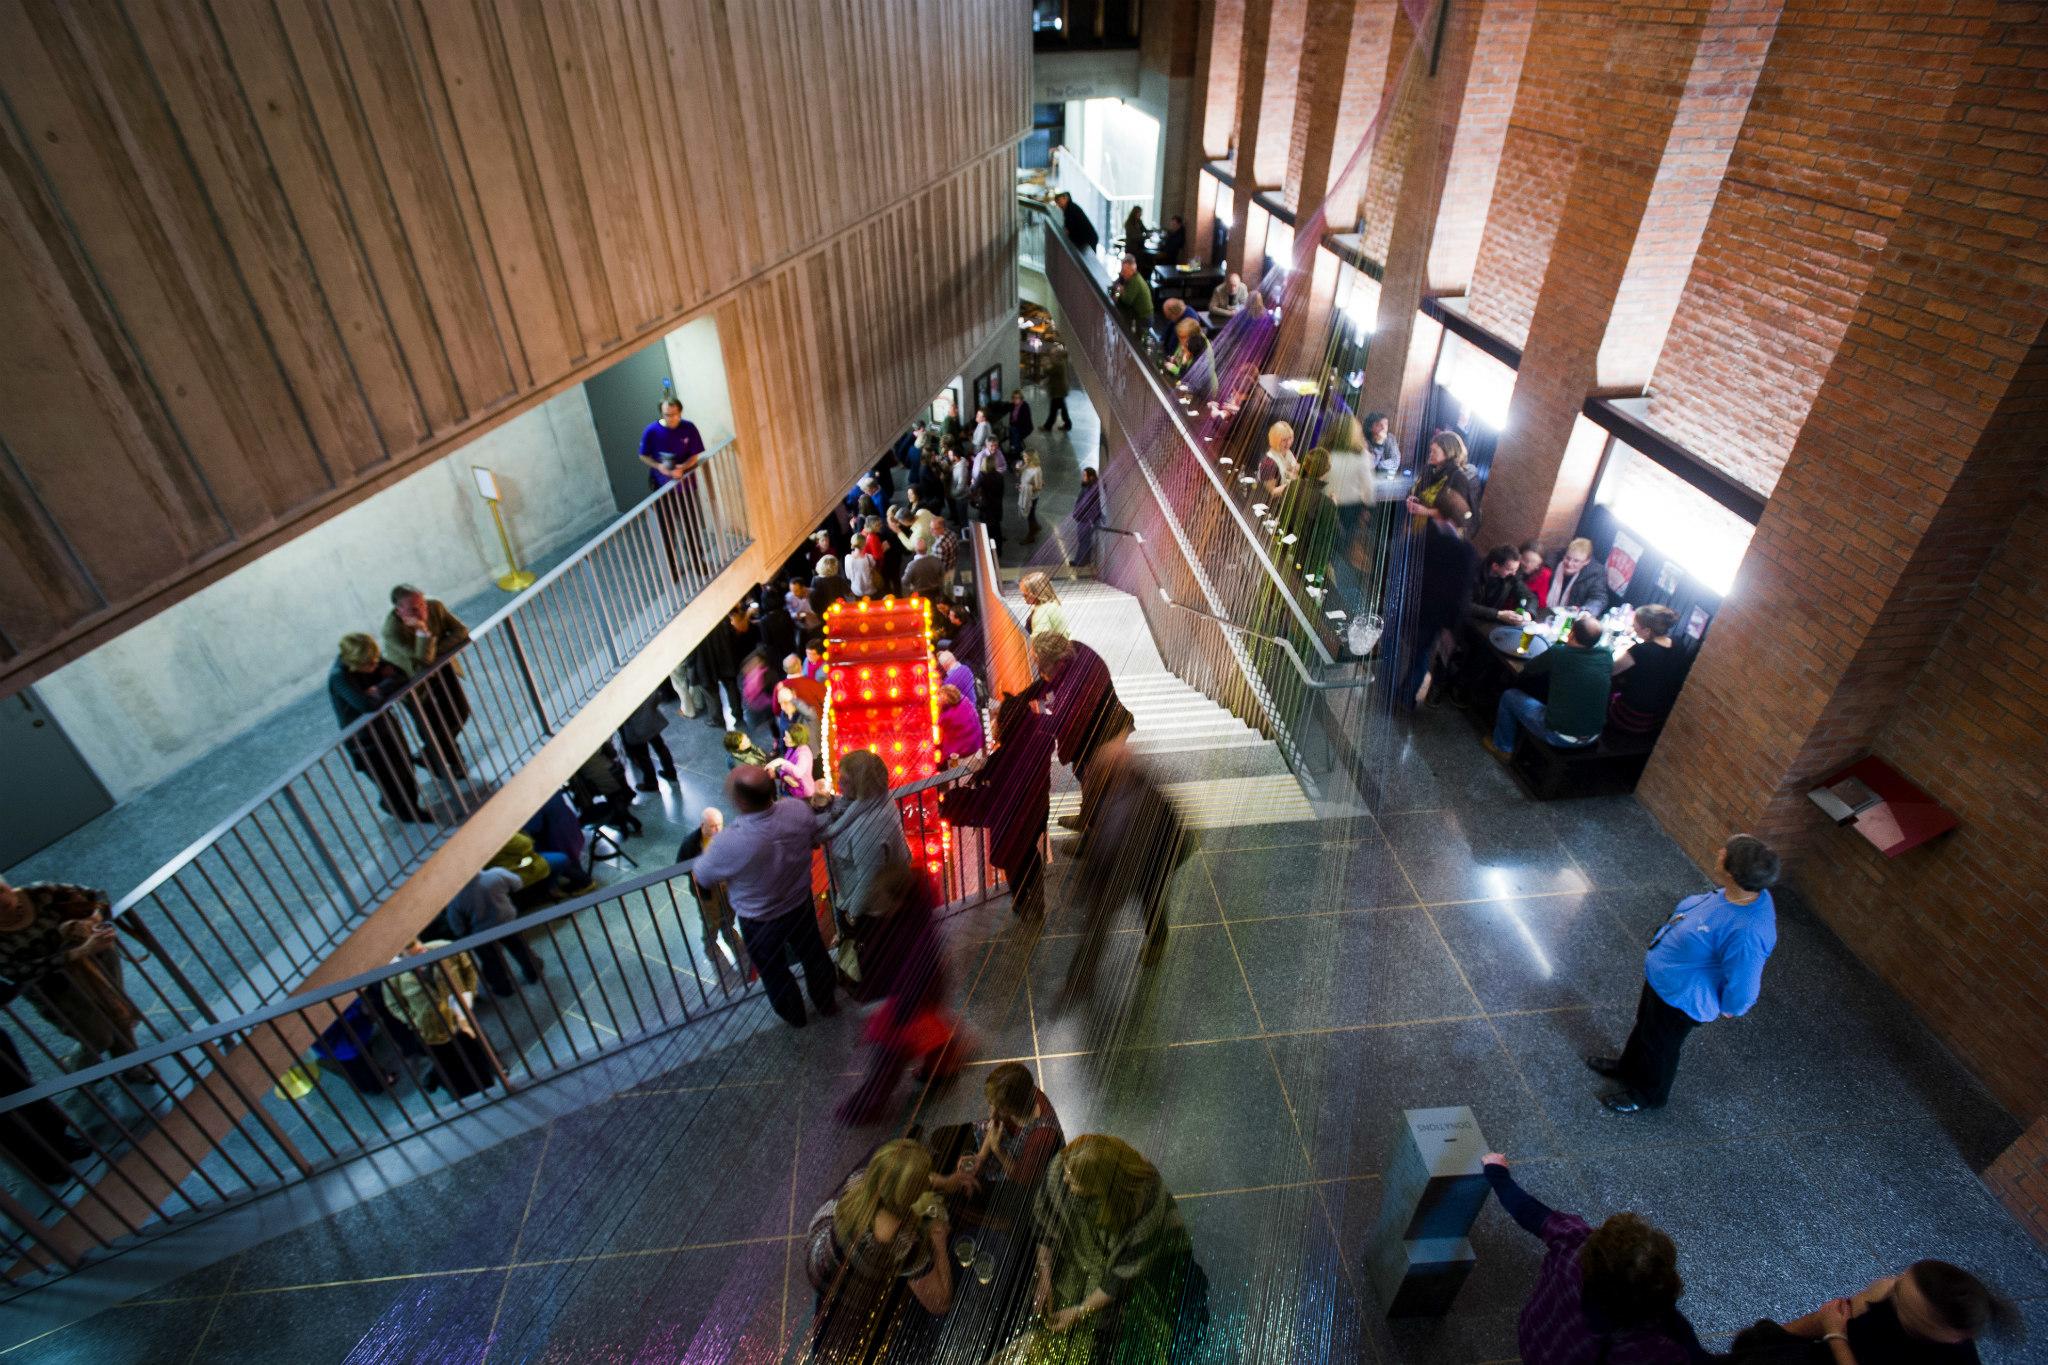 metropolitan arts centre, belfast